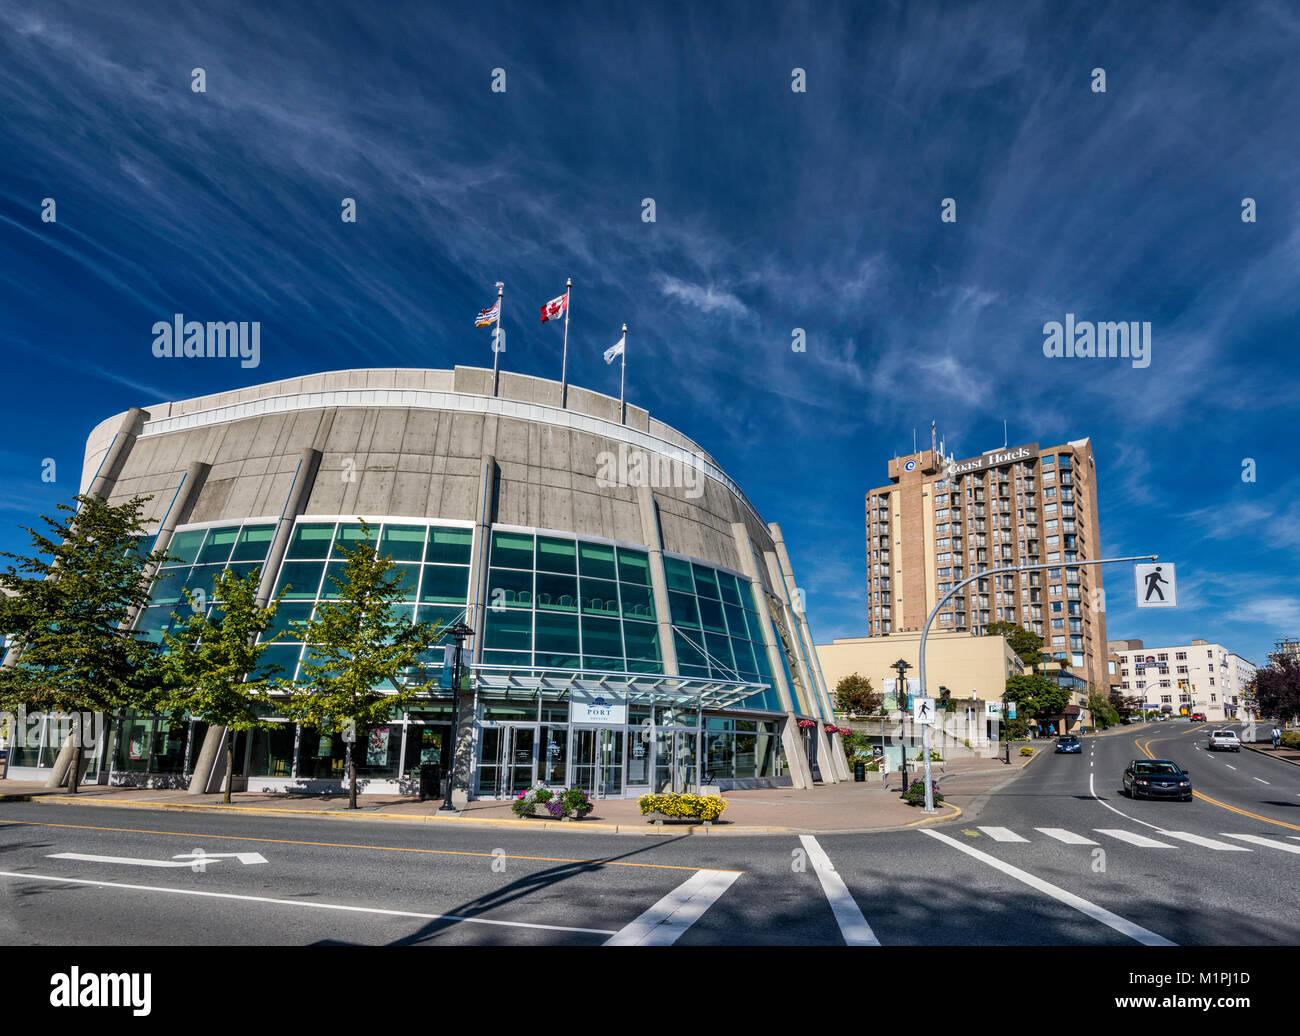 The Port Theatre at Arts District, Nanaimo, Vancouver Island, British Columbia, Canada - Stock Image